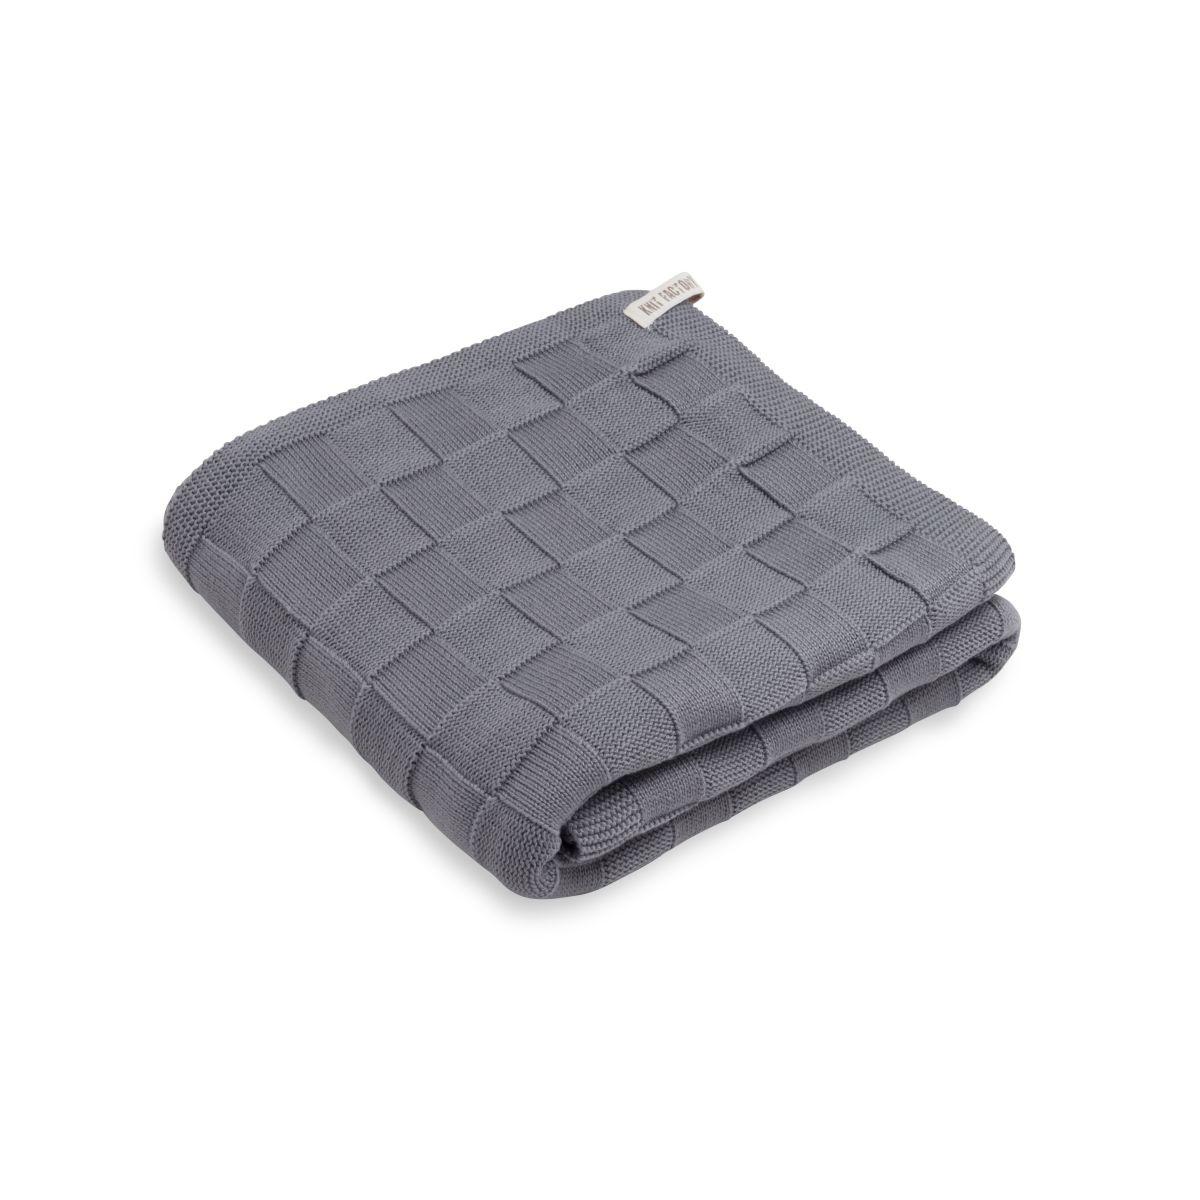 knit factory kf20222500651 badhanddoek ivy med grey 1